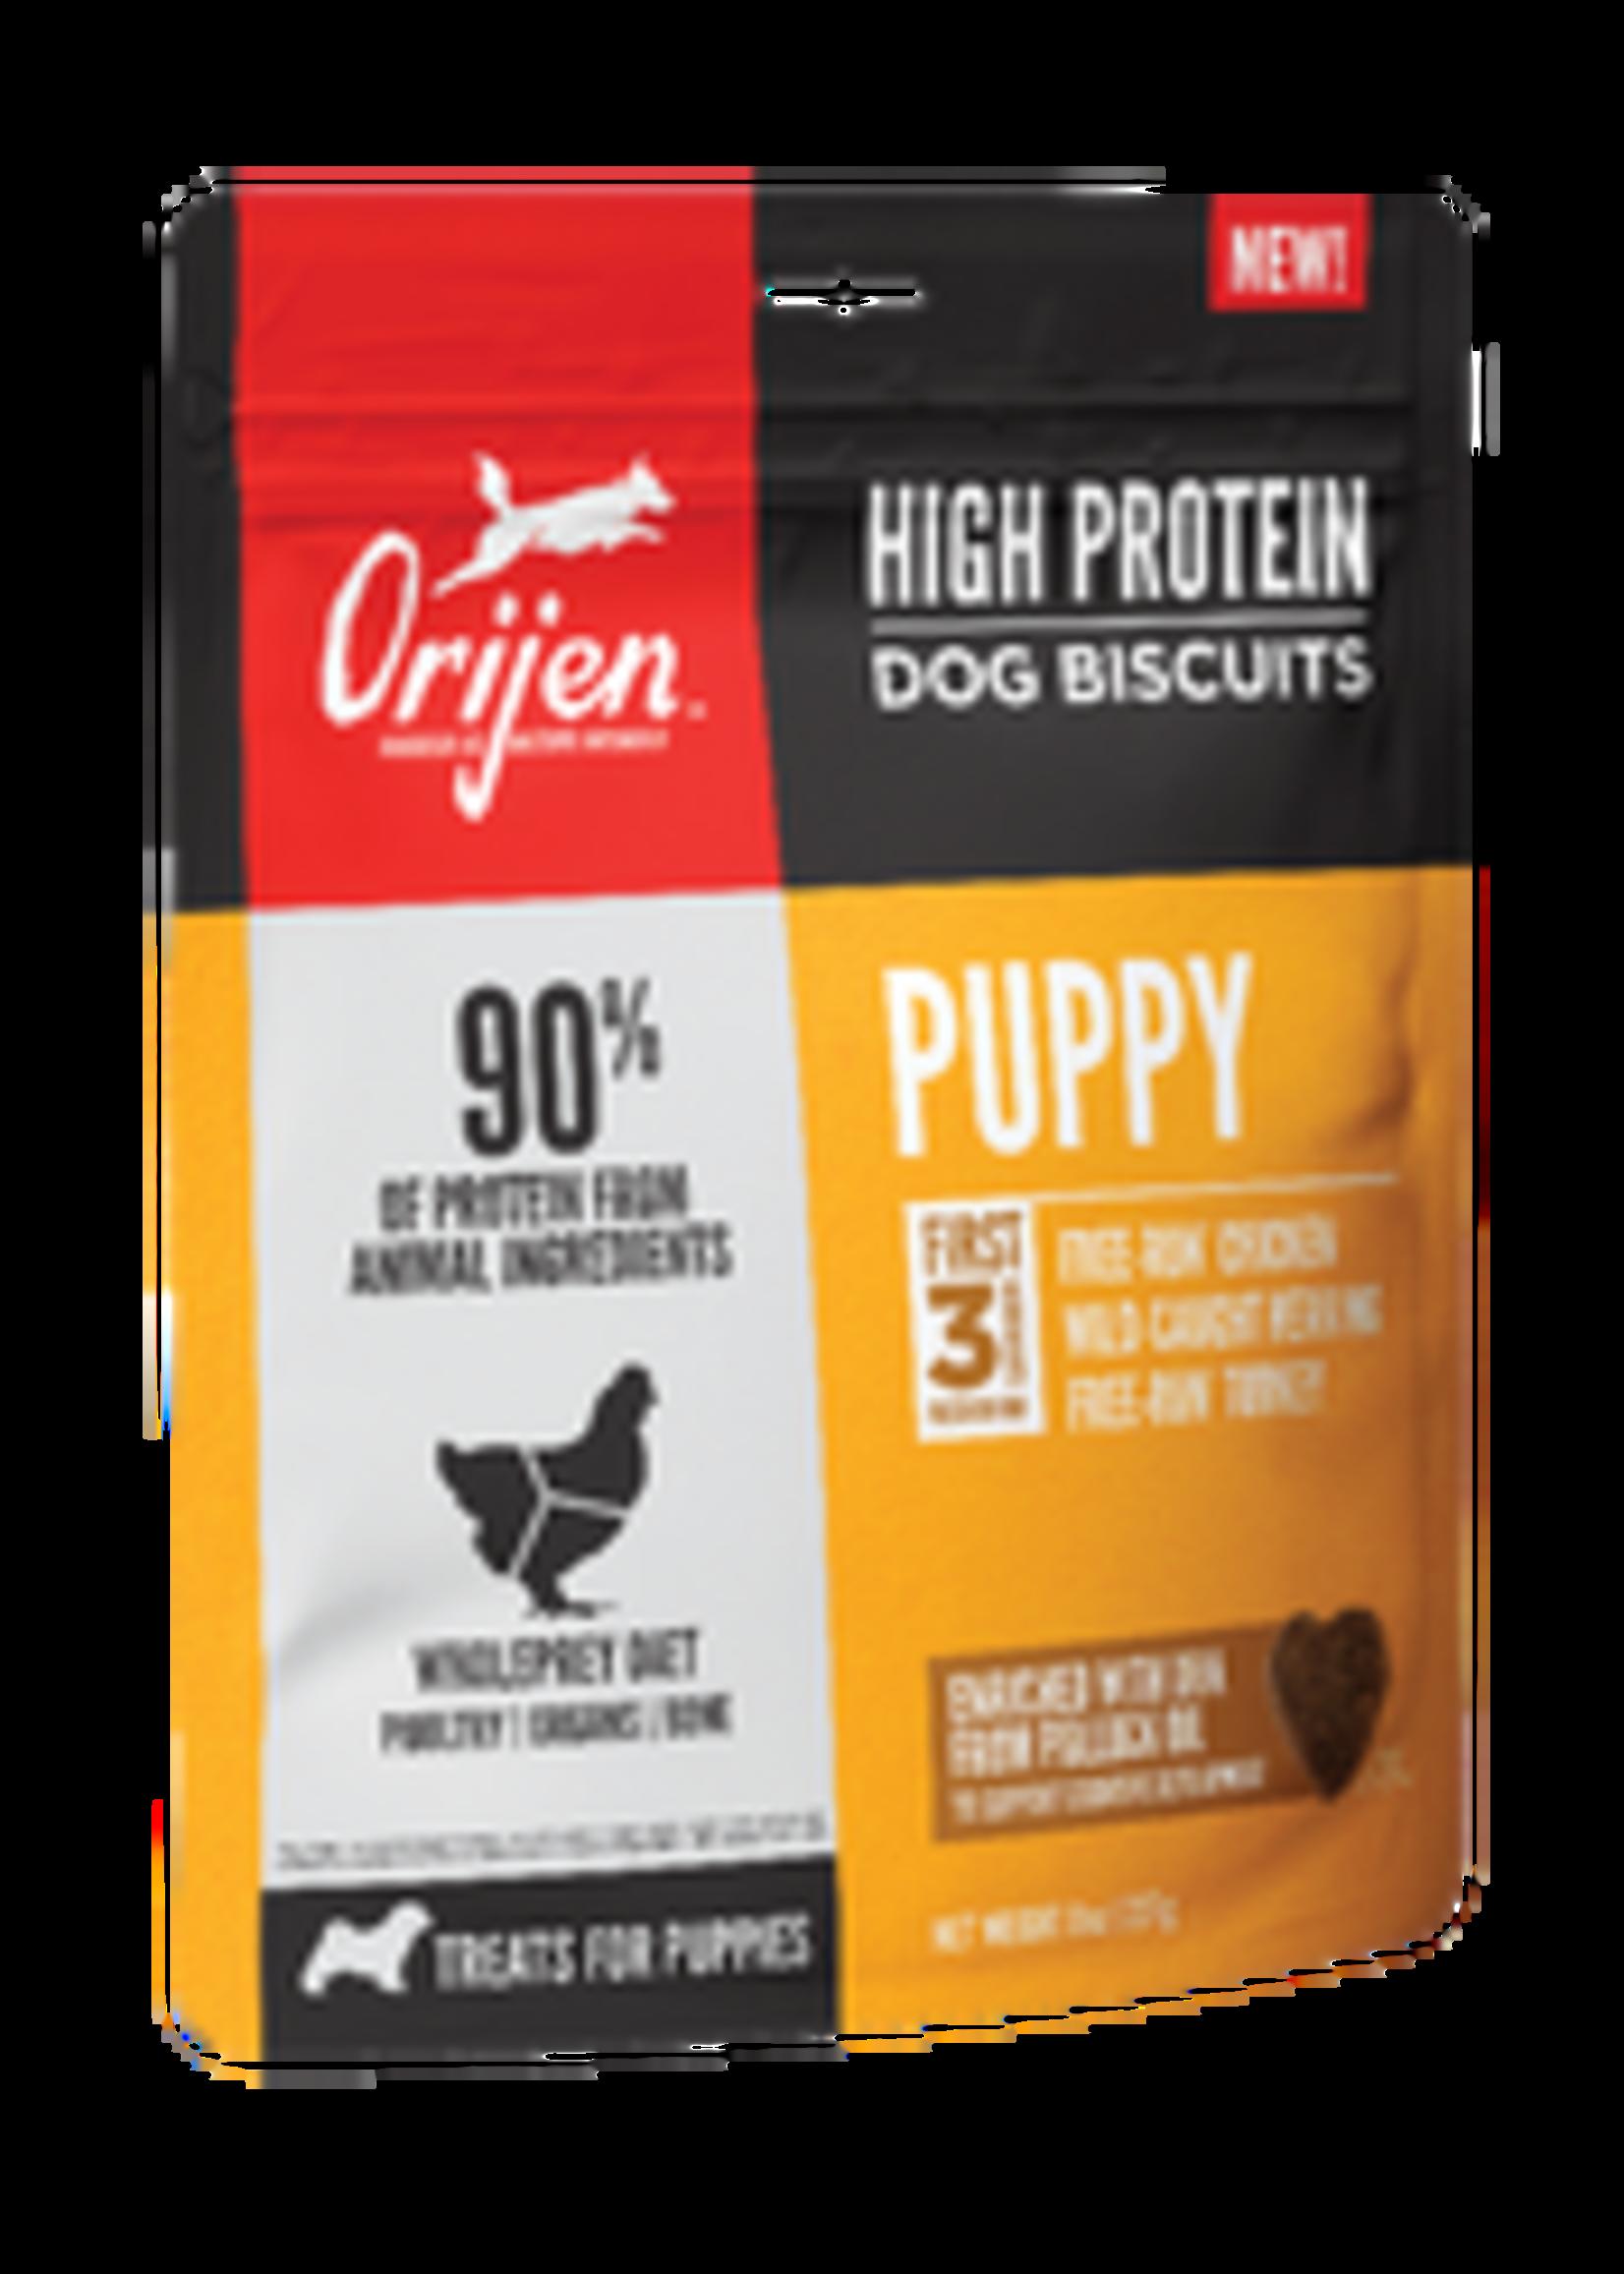 Orijen Orijen High Protein Dog Biscuits  Puppy 8 oz